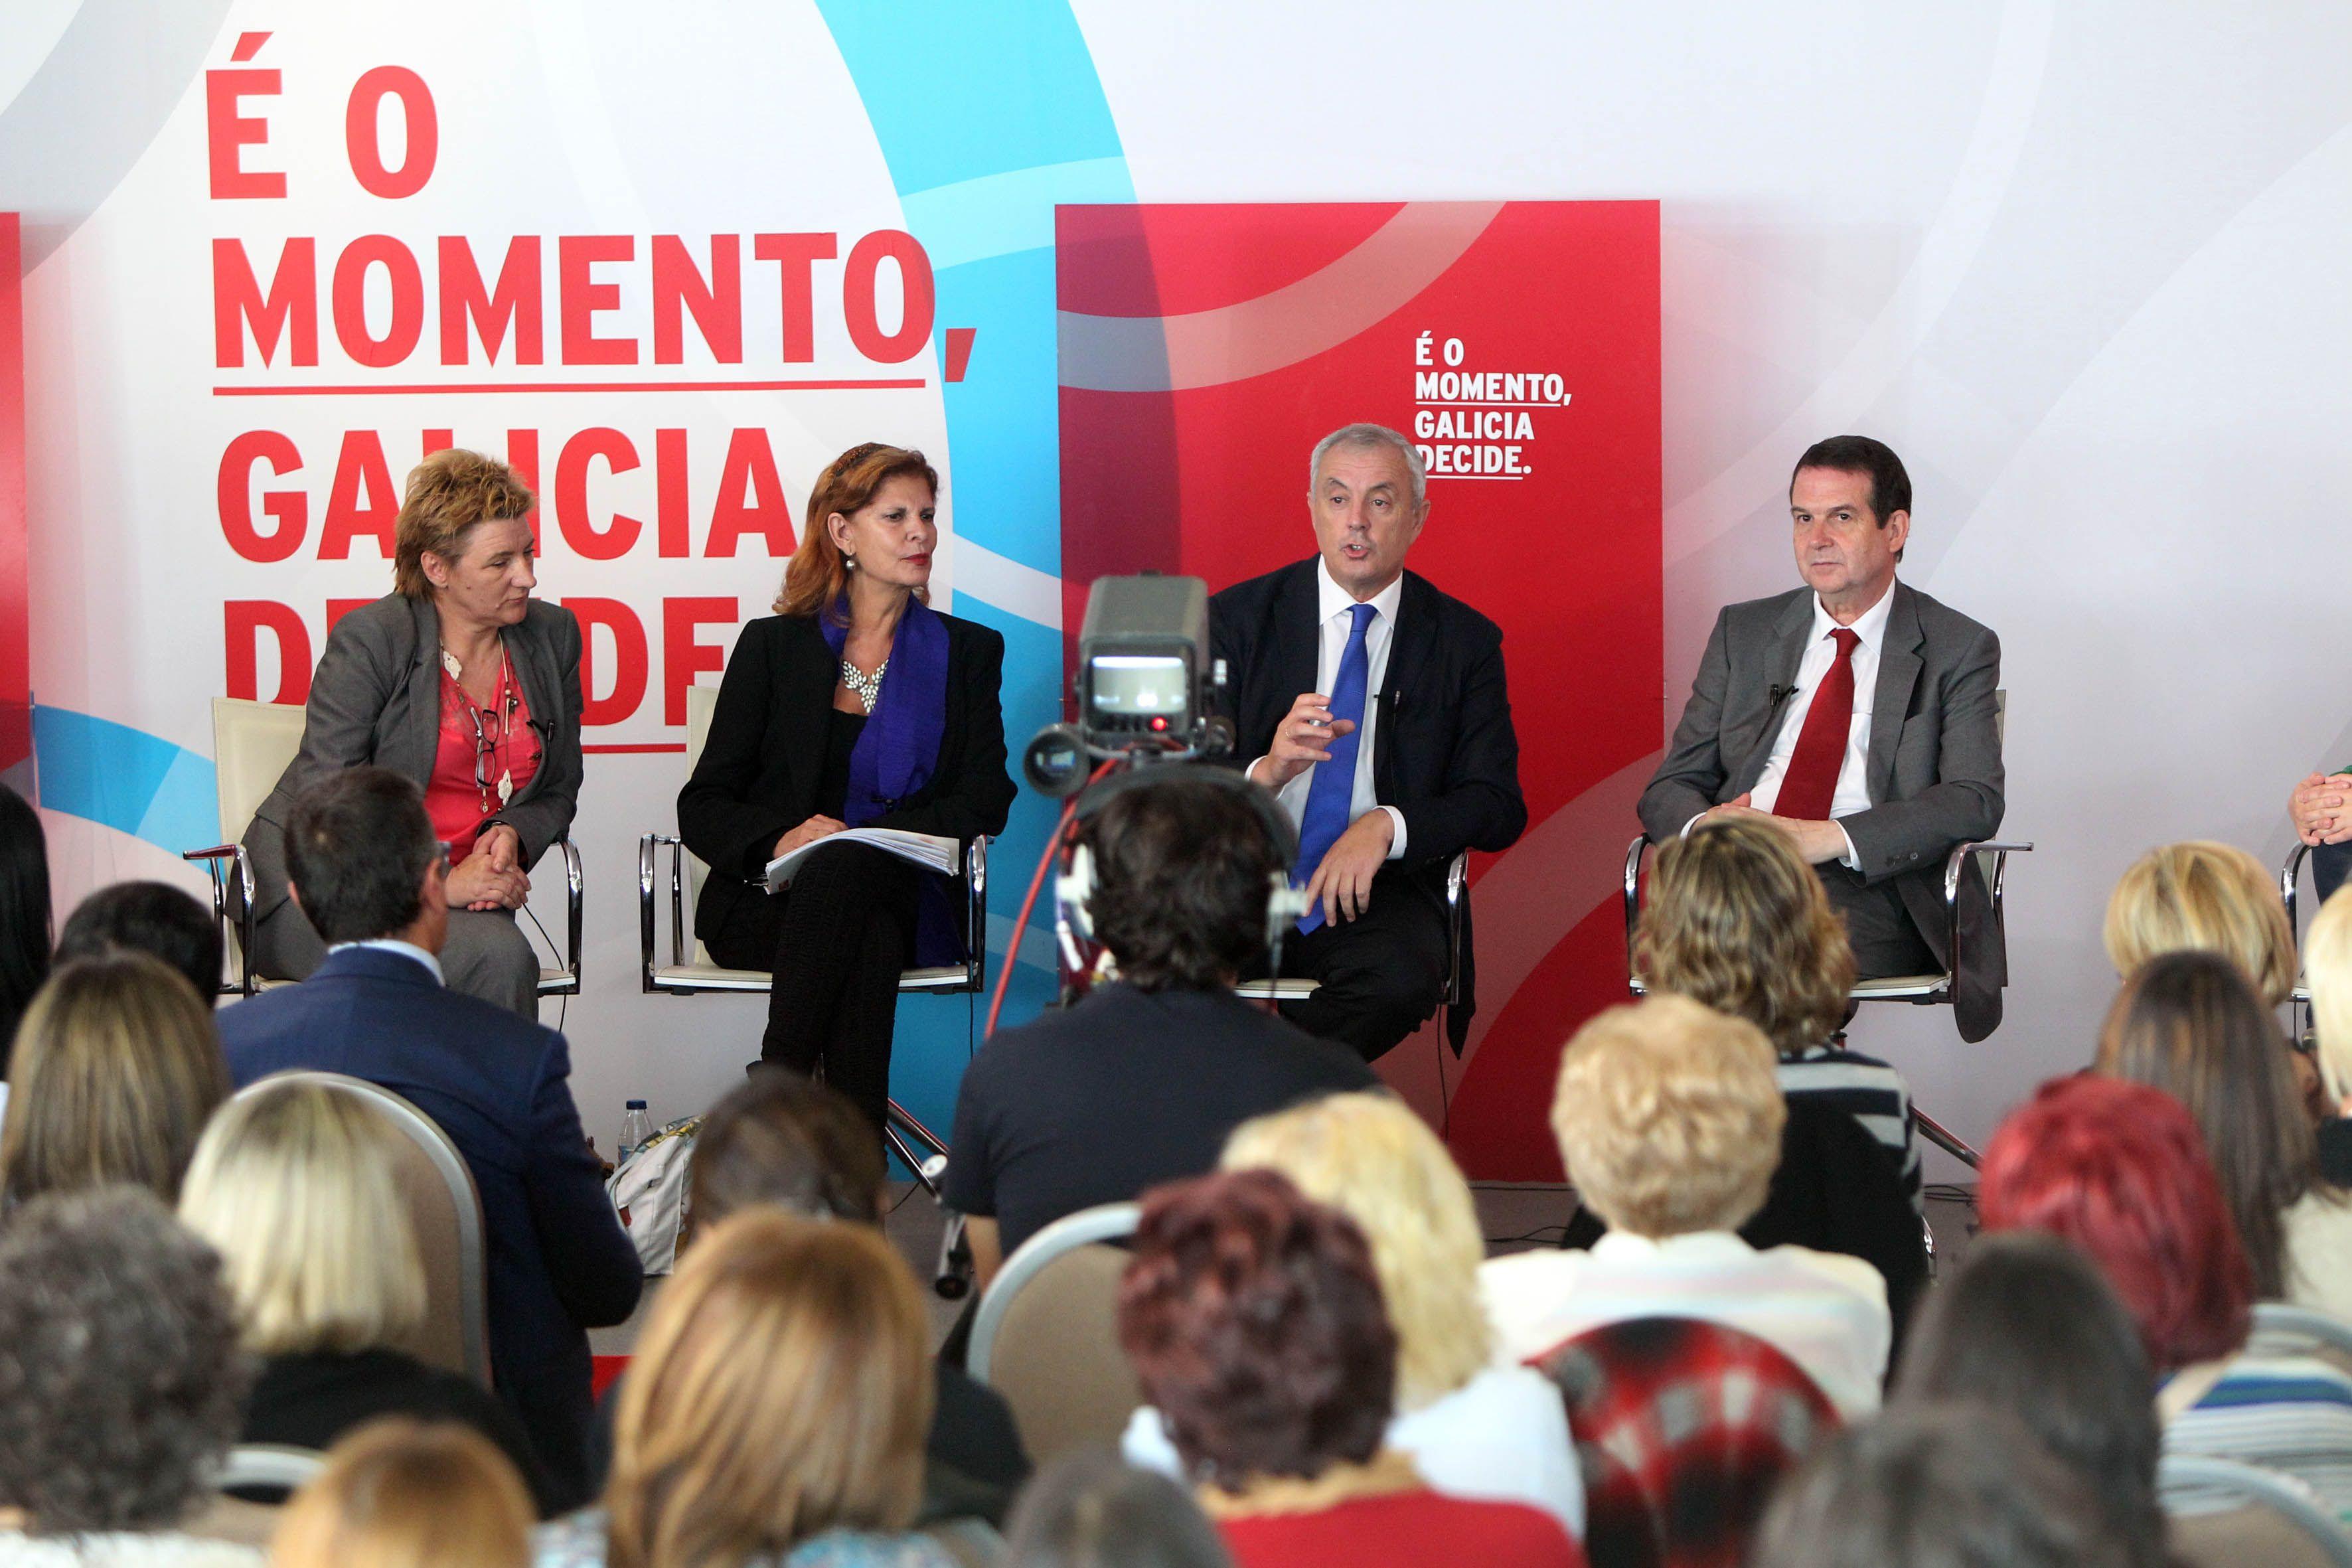 Nun acto sobre igualdade no que os socialistas galegos estivemos acompañados por Carmen Alborch.